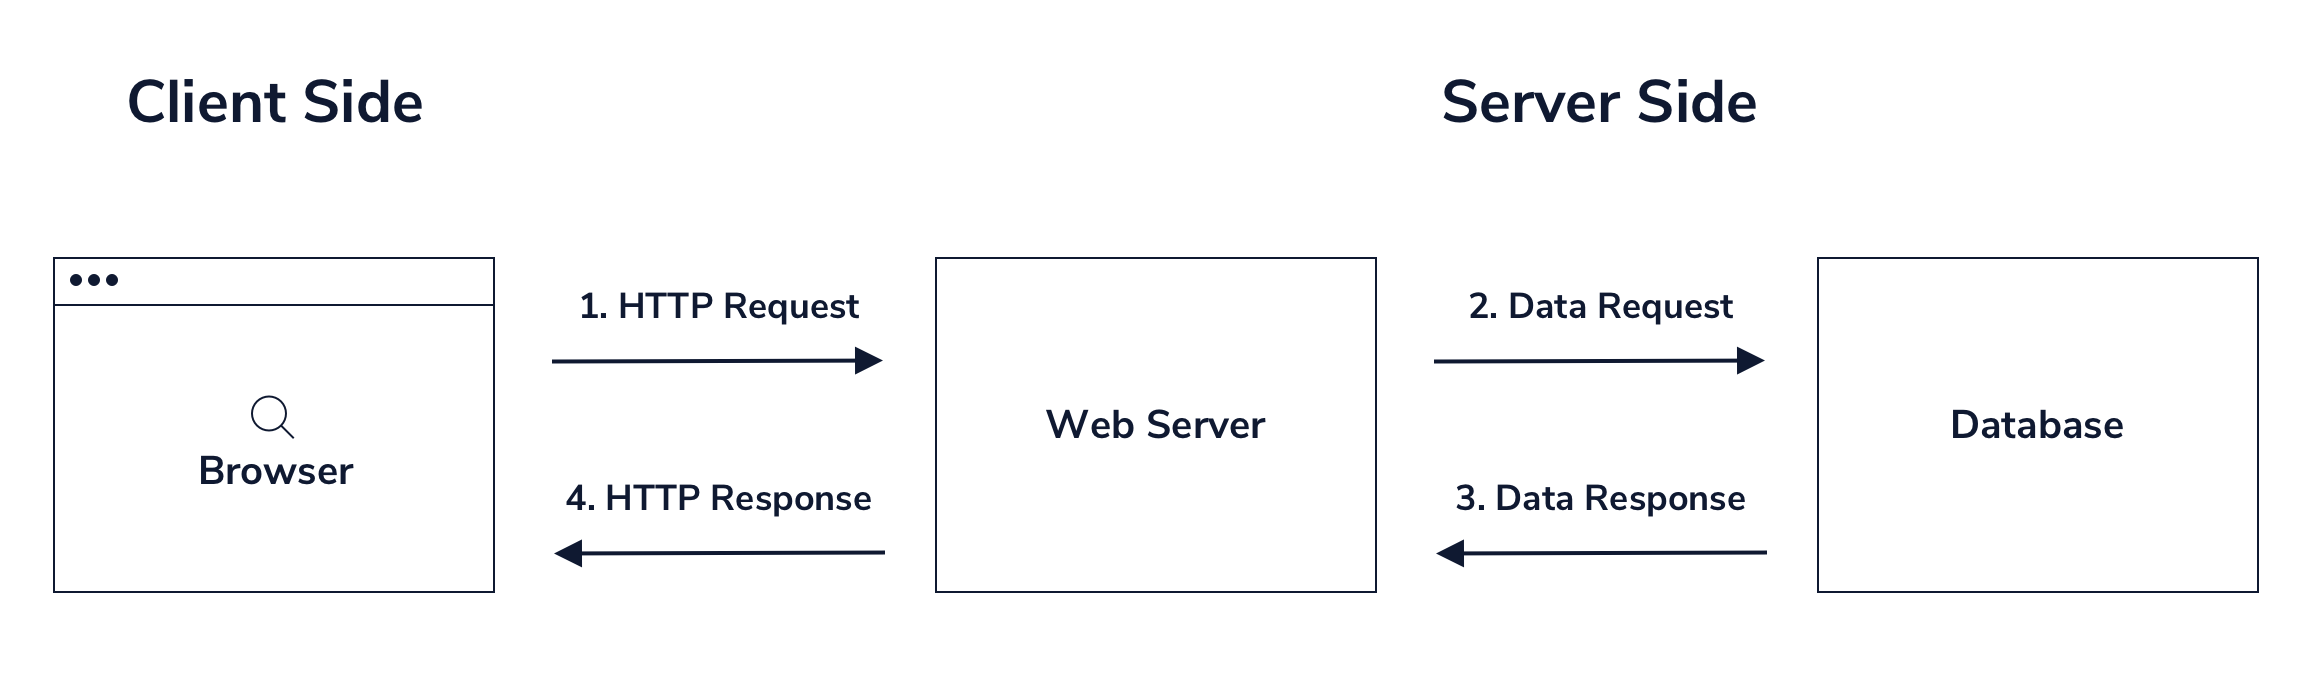 Server to database diagram